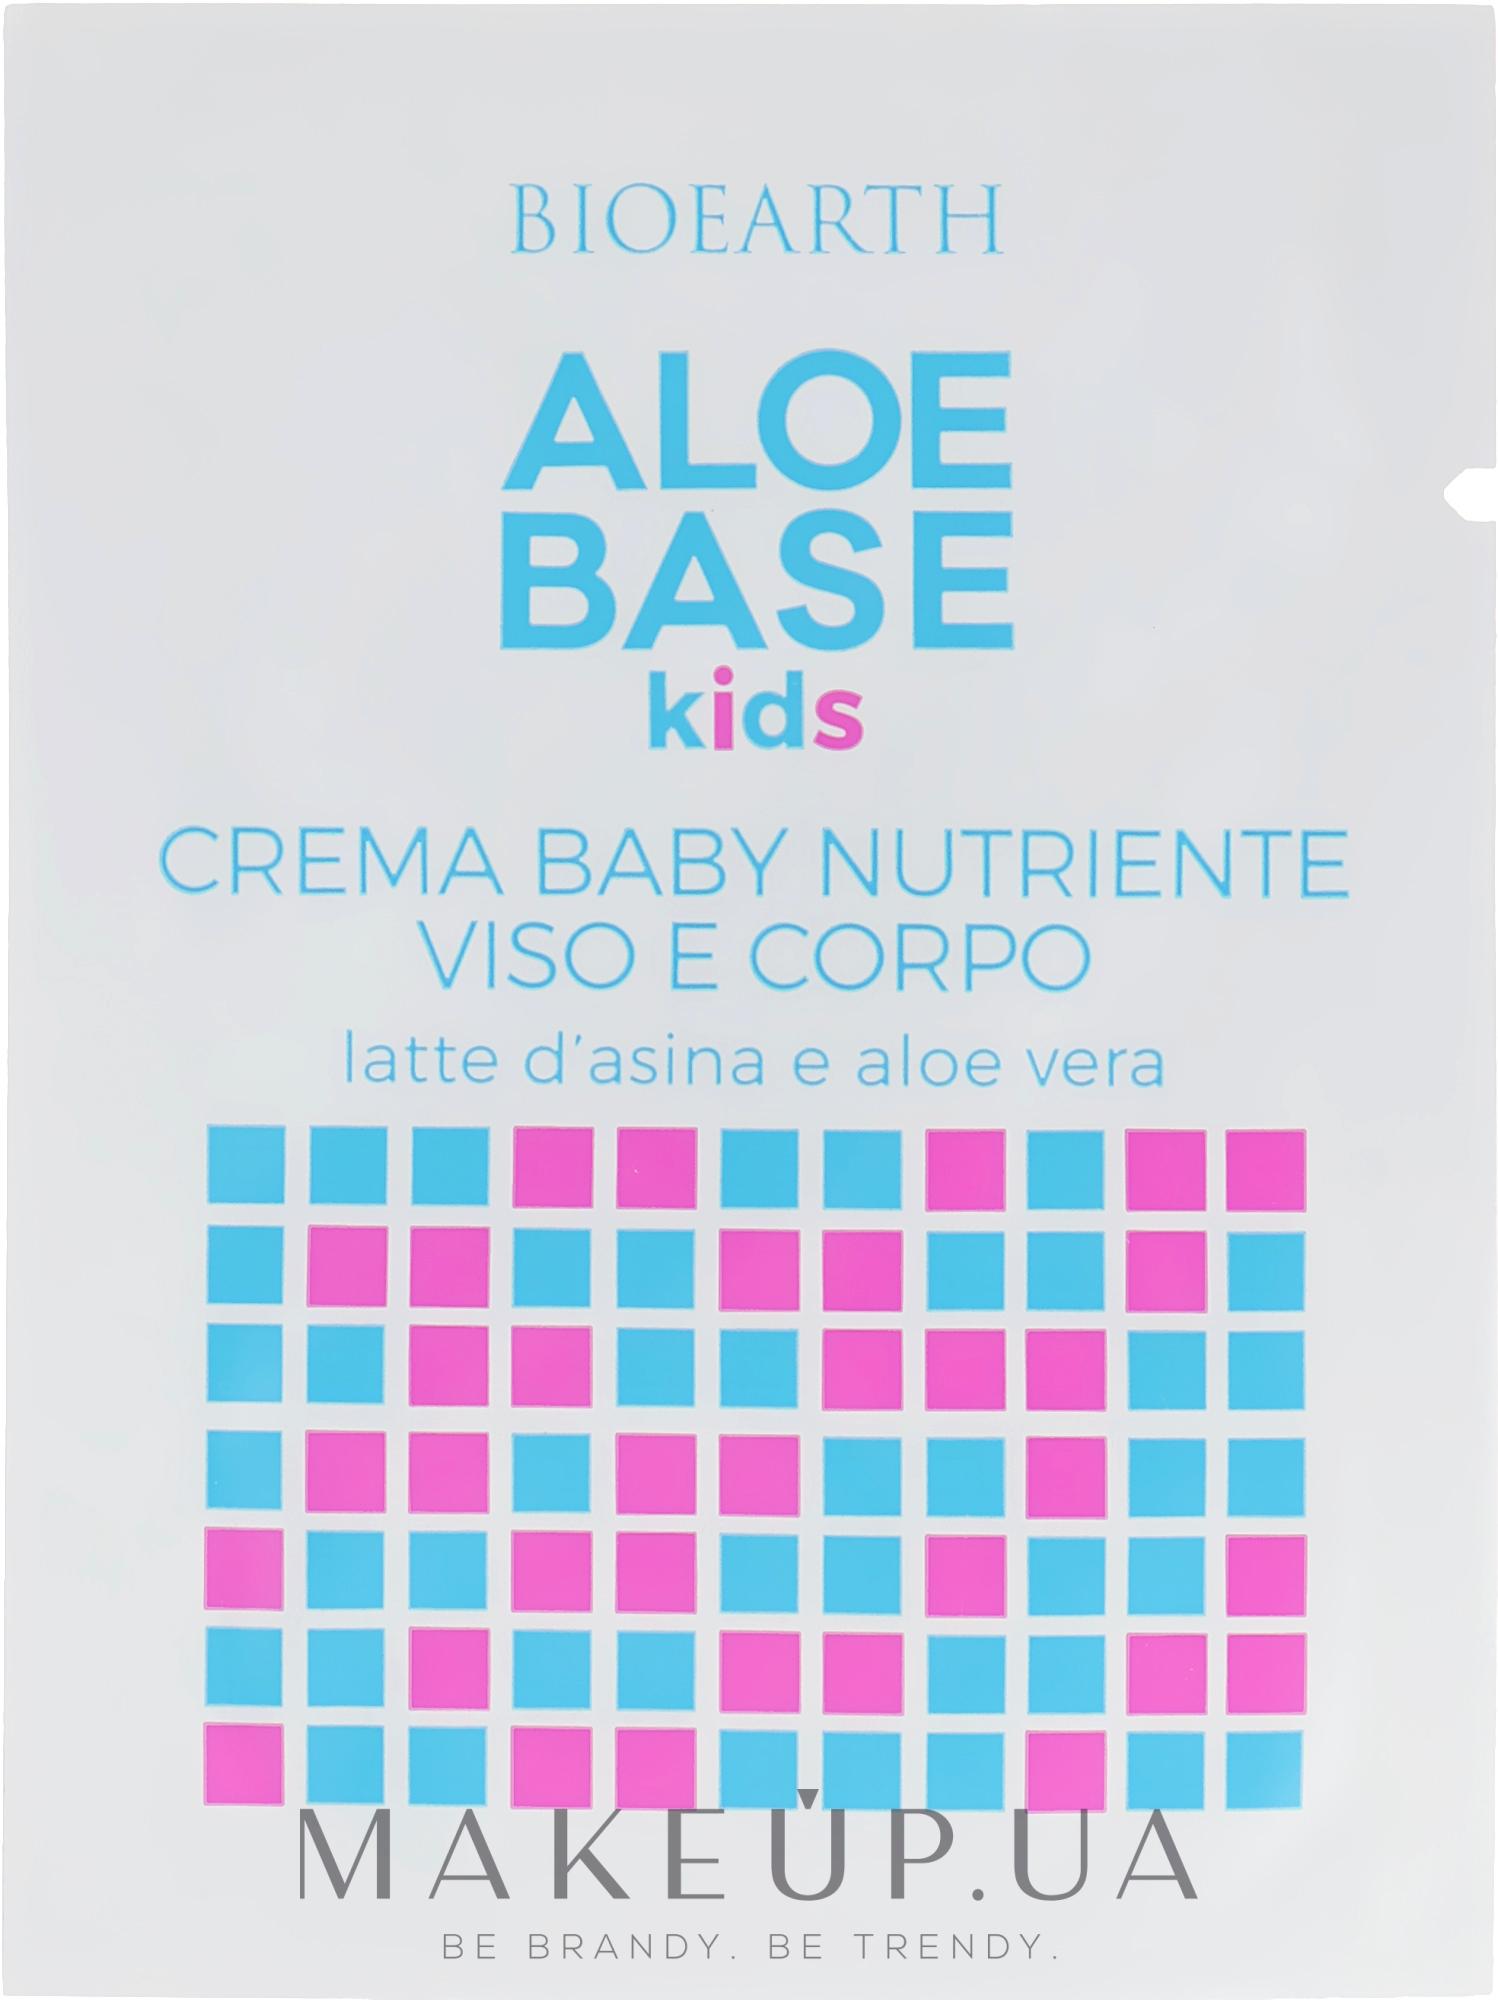 Увлажняющий крем для лица и тела для младенцев - Bioearth Aloebase Kids Nourishing Baby Cream Face and Body with Aloe (пробник) — фото 3ml